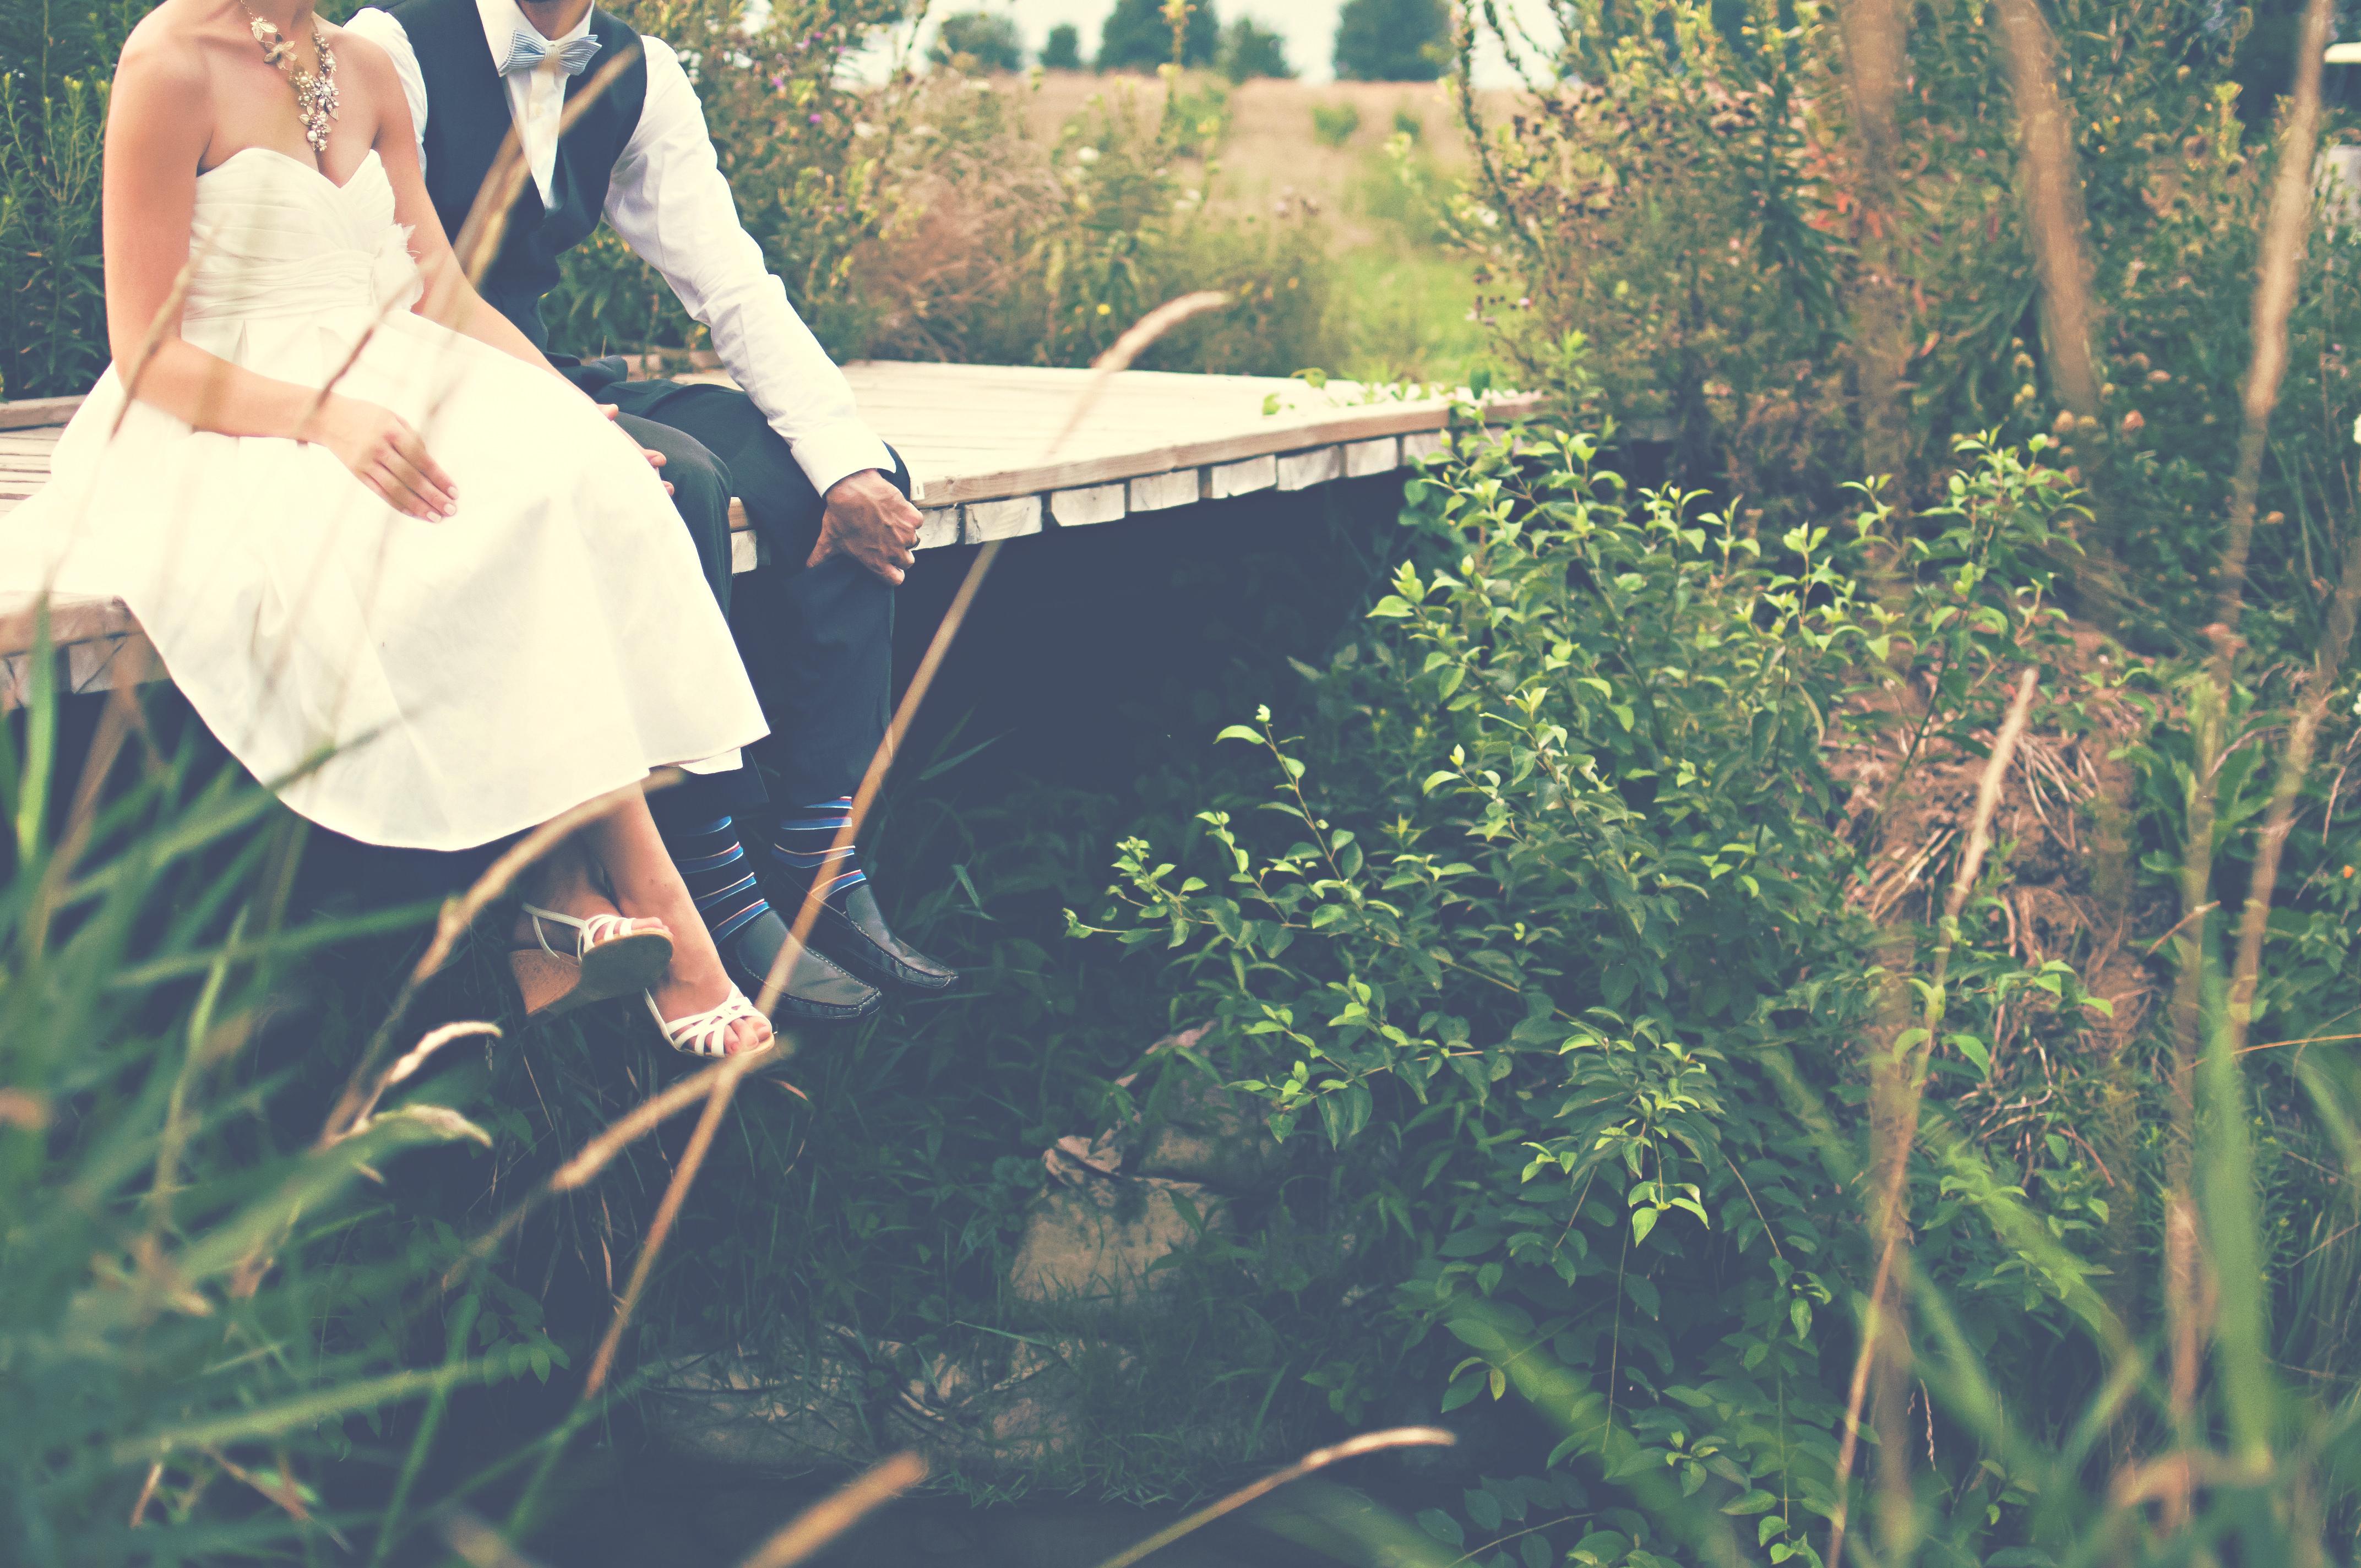 Man Water Gr People Woman Bridge Sunlight Flower Love Green Sitting Wedding Dress Bride